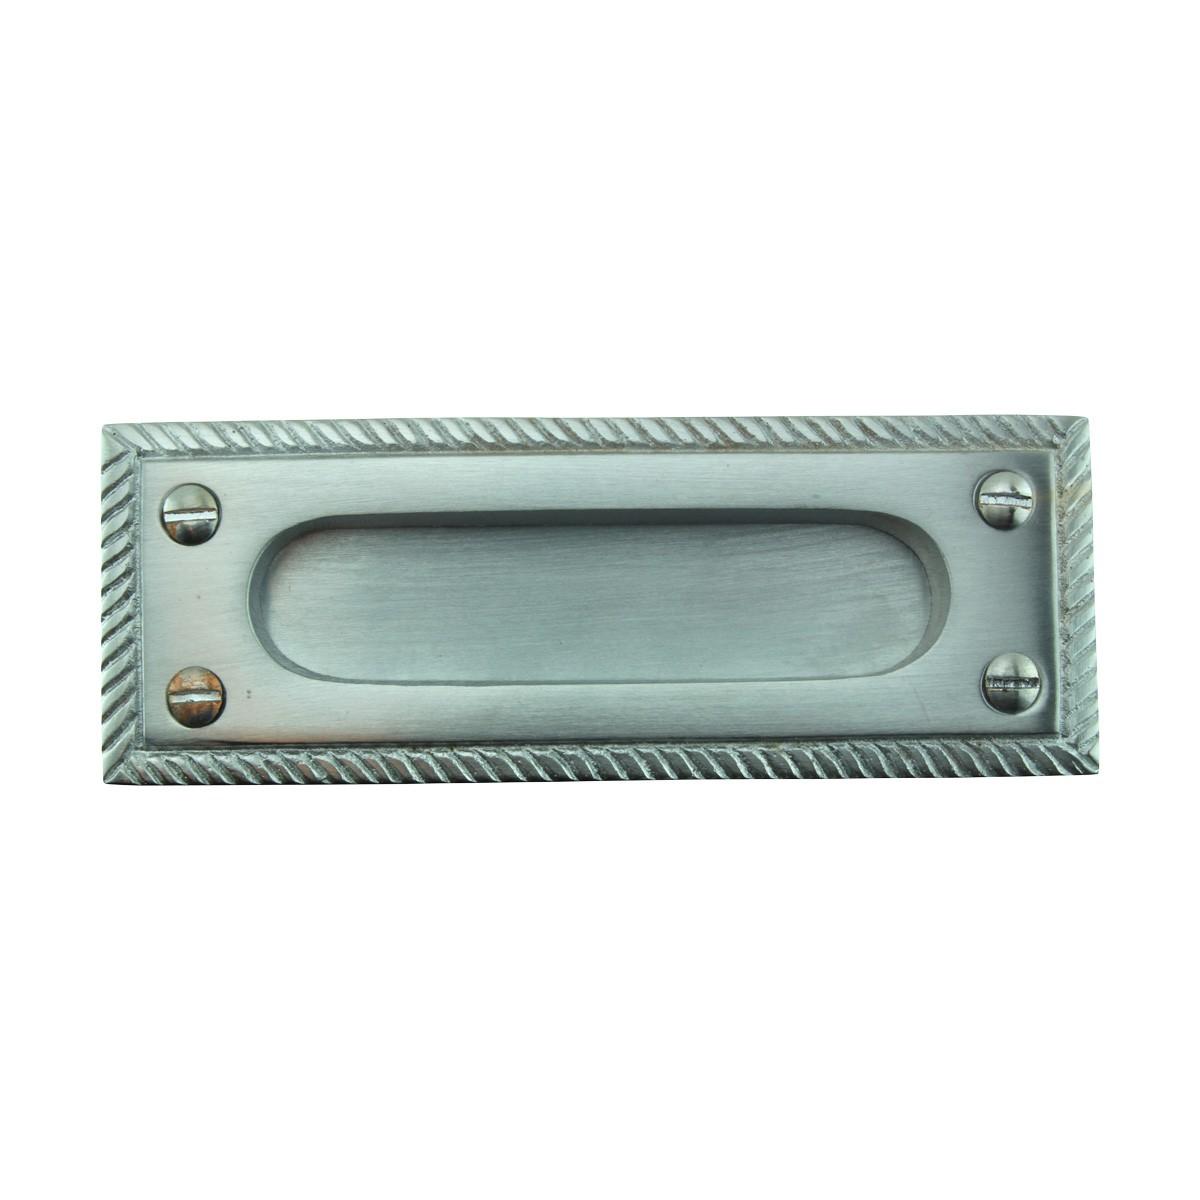 4 Rope Sash Lift Satin Chrome Brass Rectangular Chrome Sash Lift Sash Lift Brass Window Sash Hardware